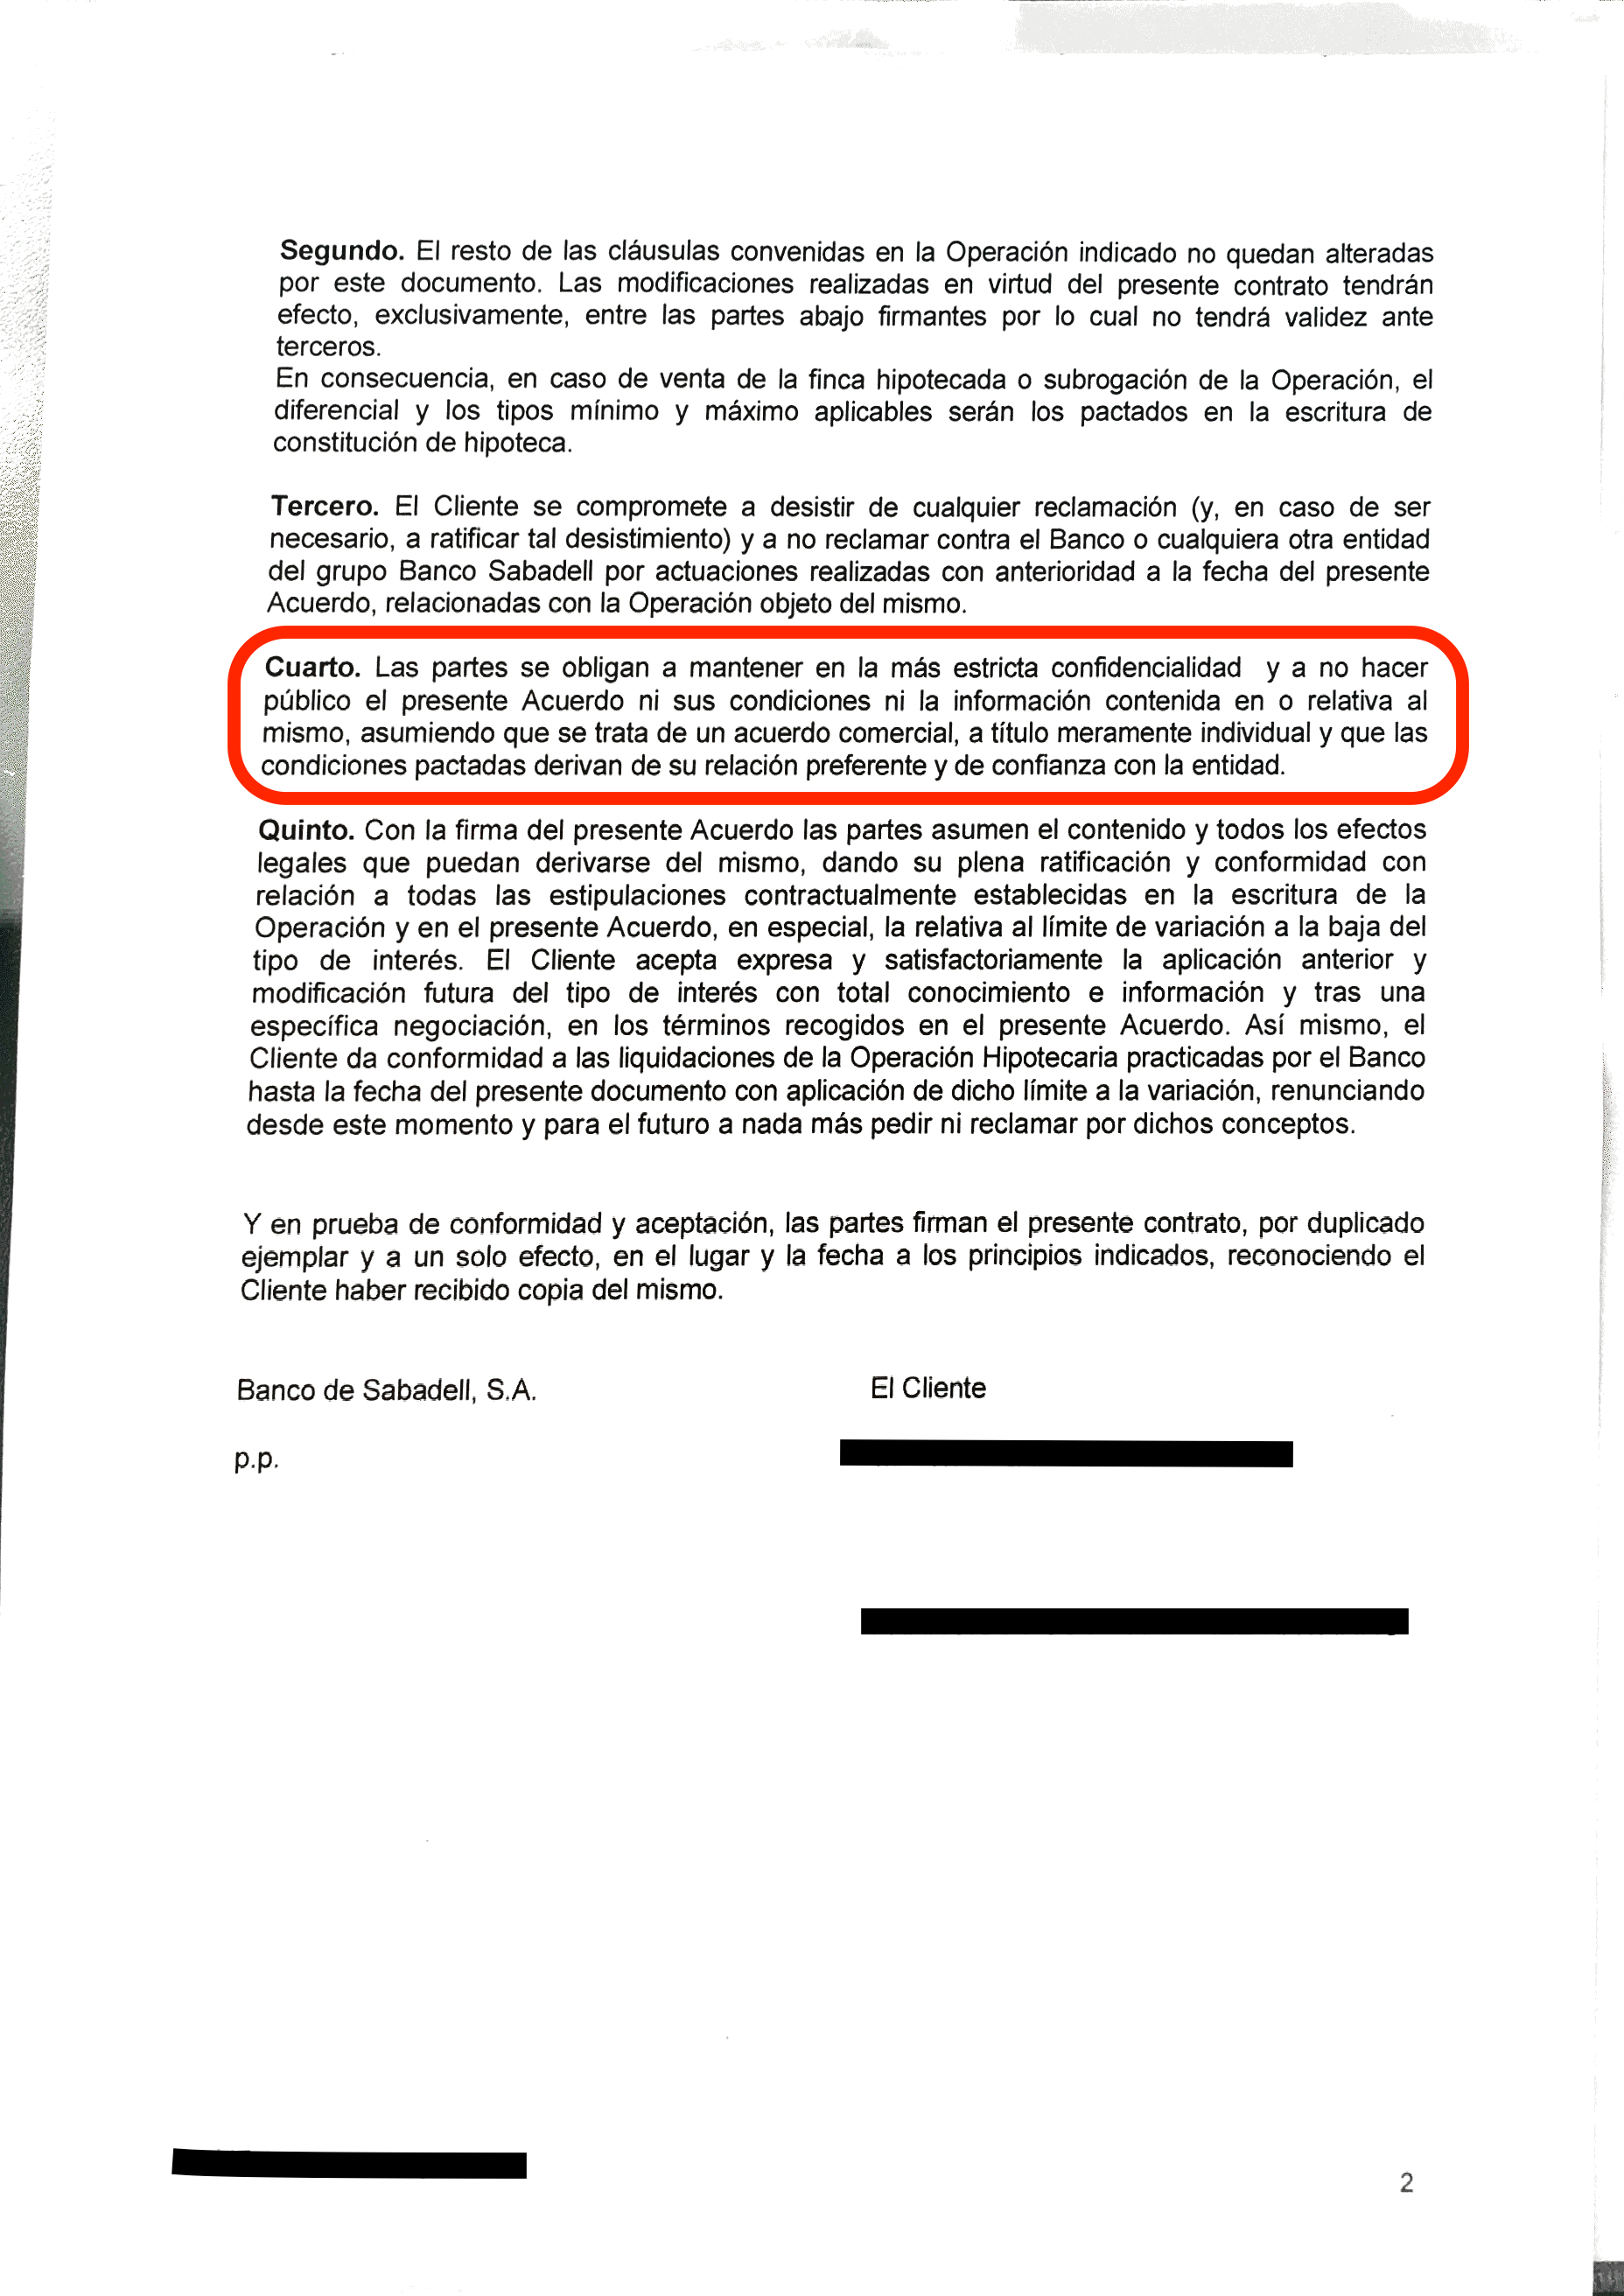 Sabadell obliga a sus clientes a firmar un pacto de for Validez acuerdo privado clausula suelo